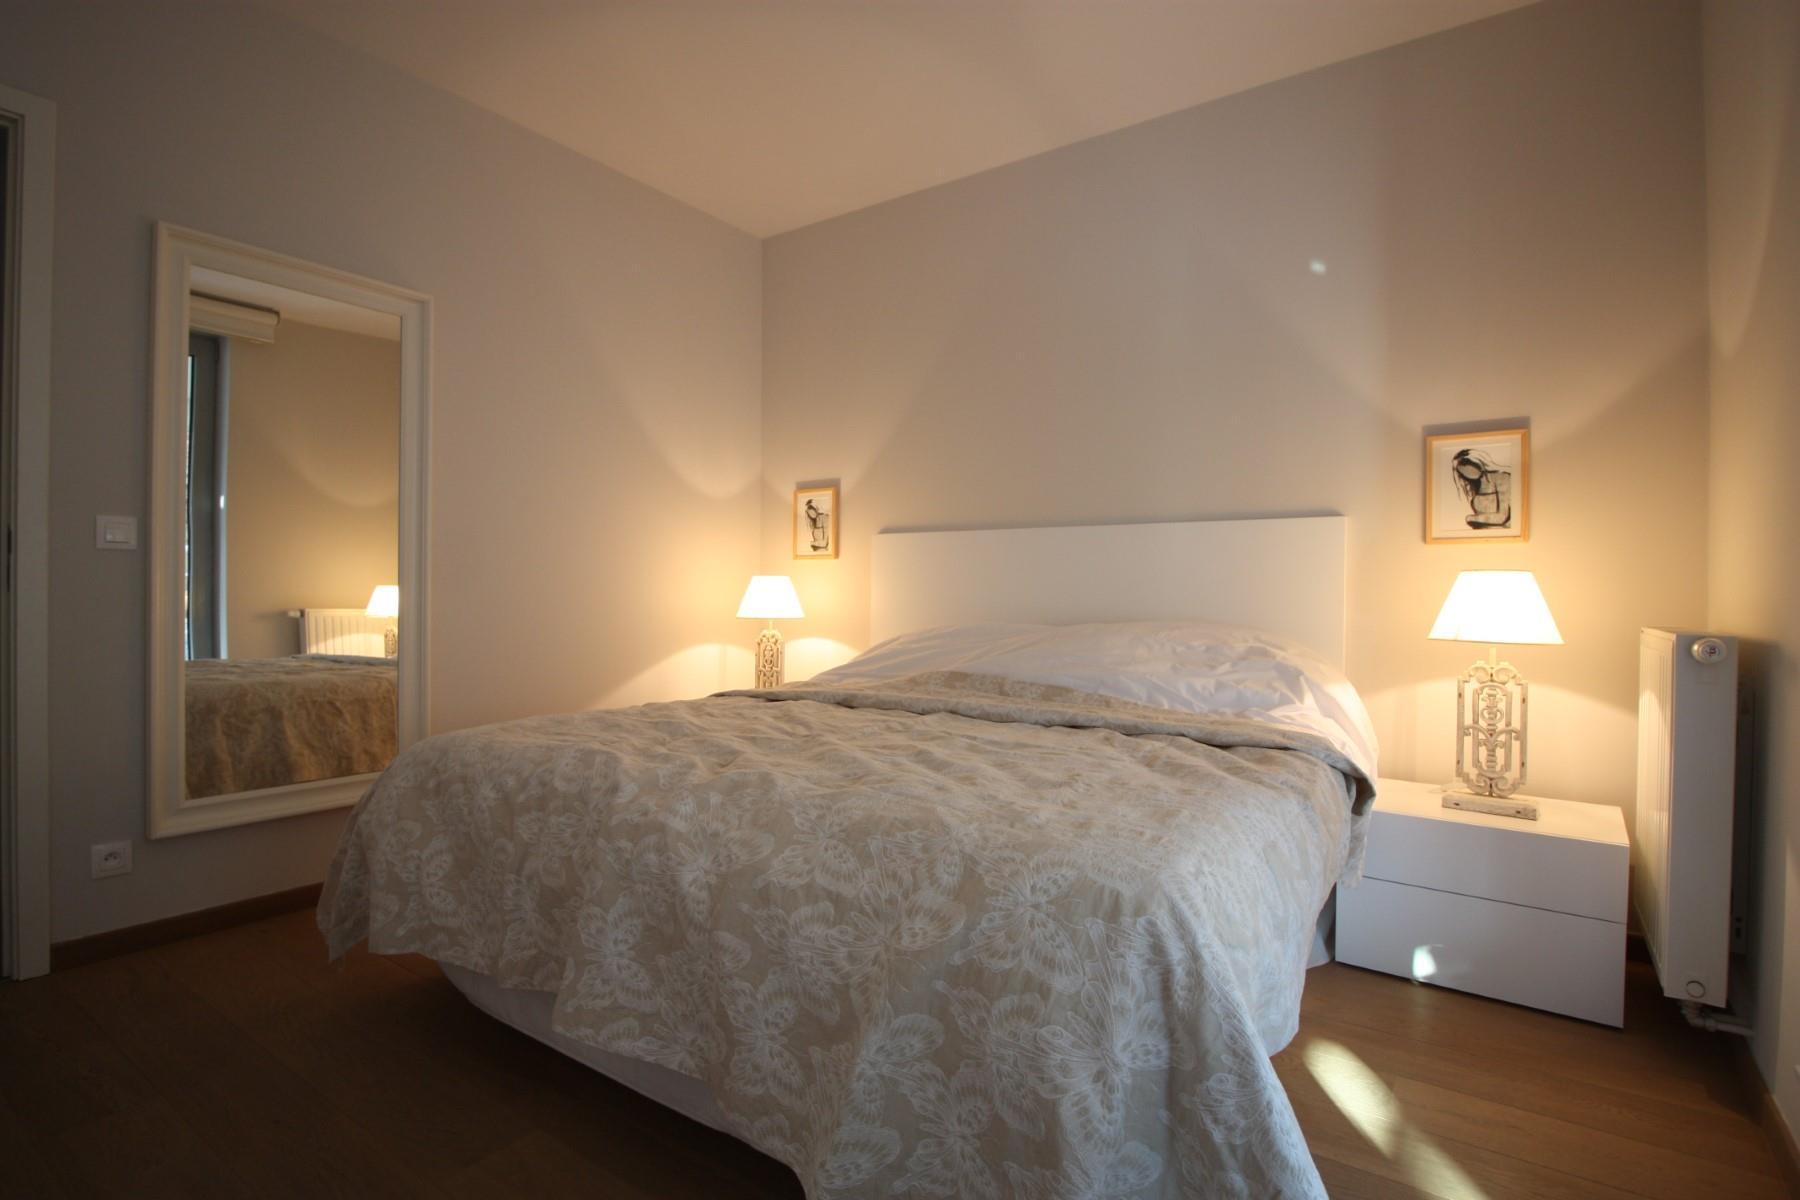 Flat - Etterbeek - #4527457-15